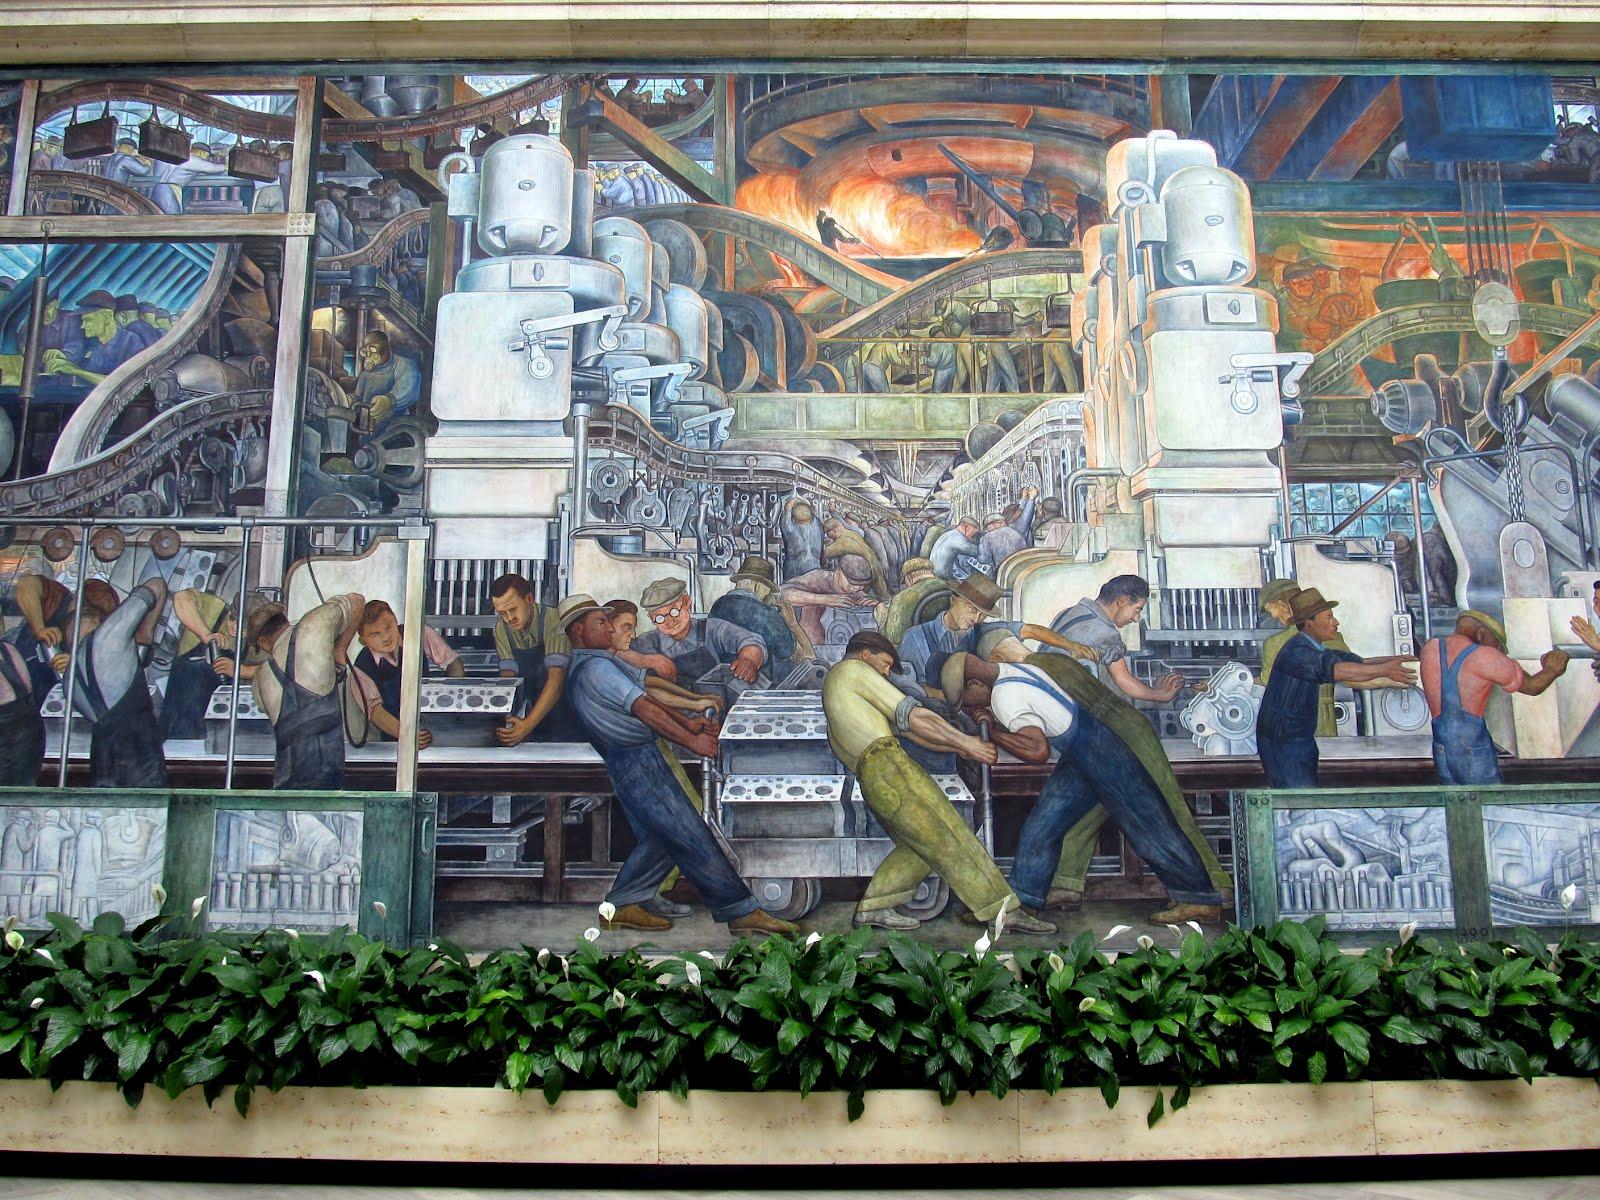 The marmelade gypsy primary blog diamonds in the desert for Detroit mural factory